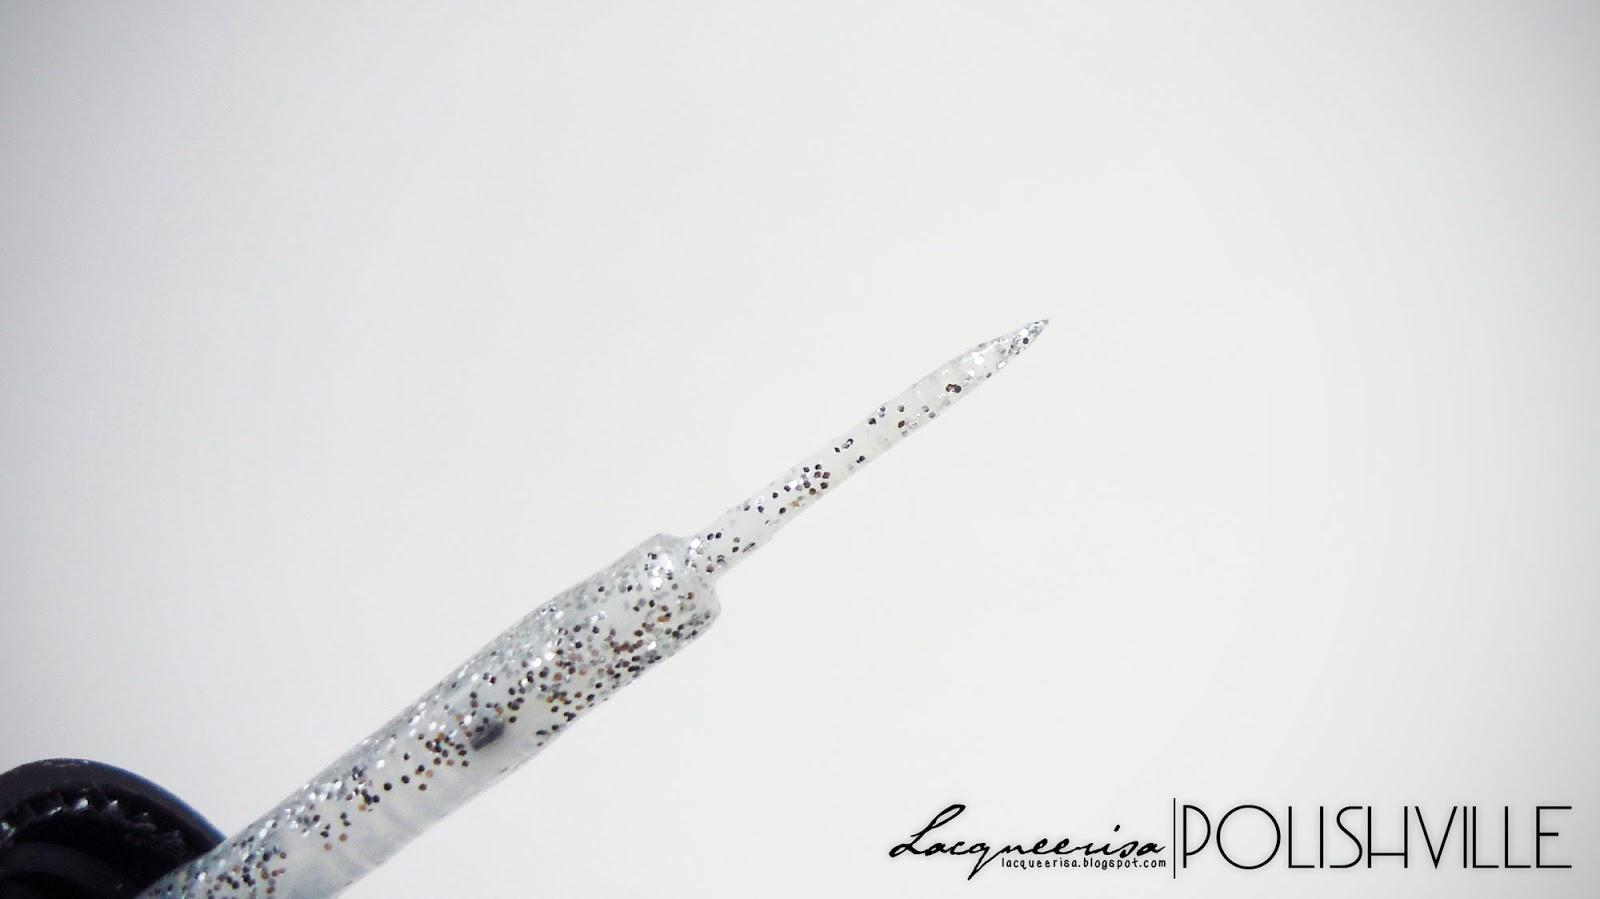 LacqueerisaXPolishville: Enamel Art 1000 Silver Glitter